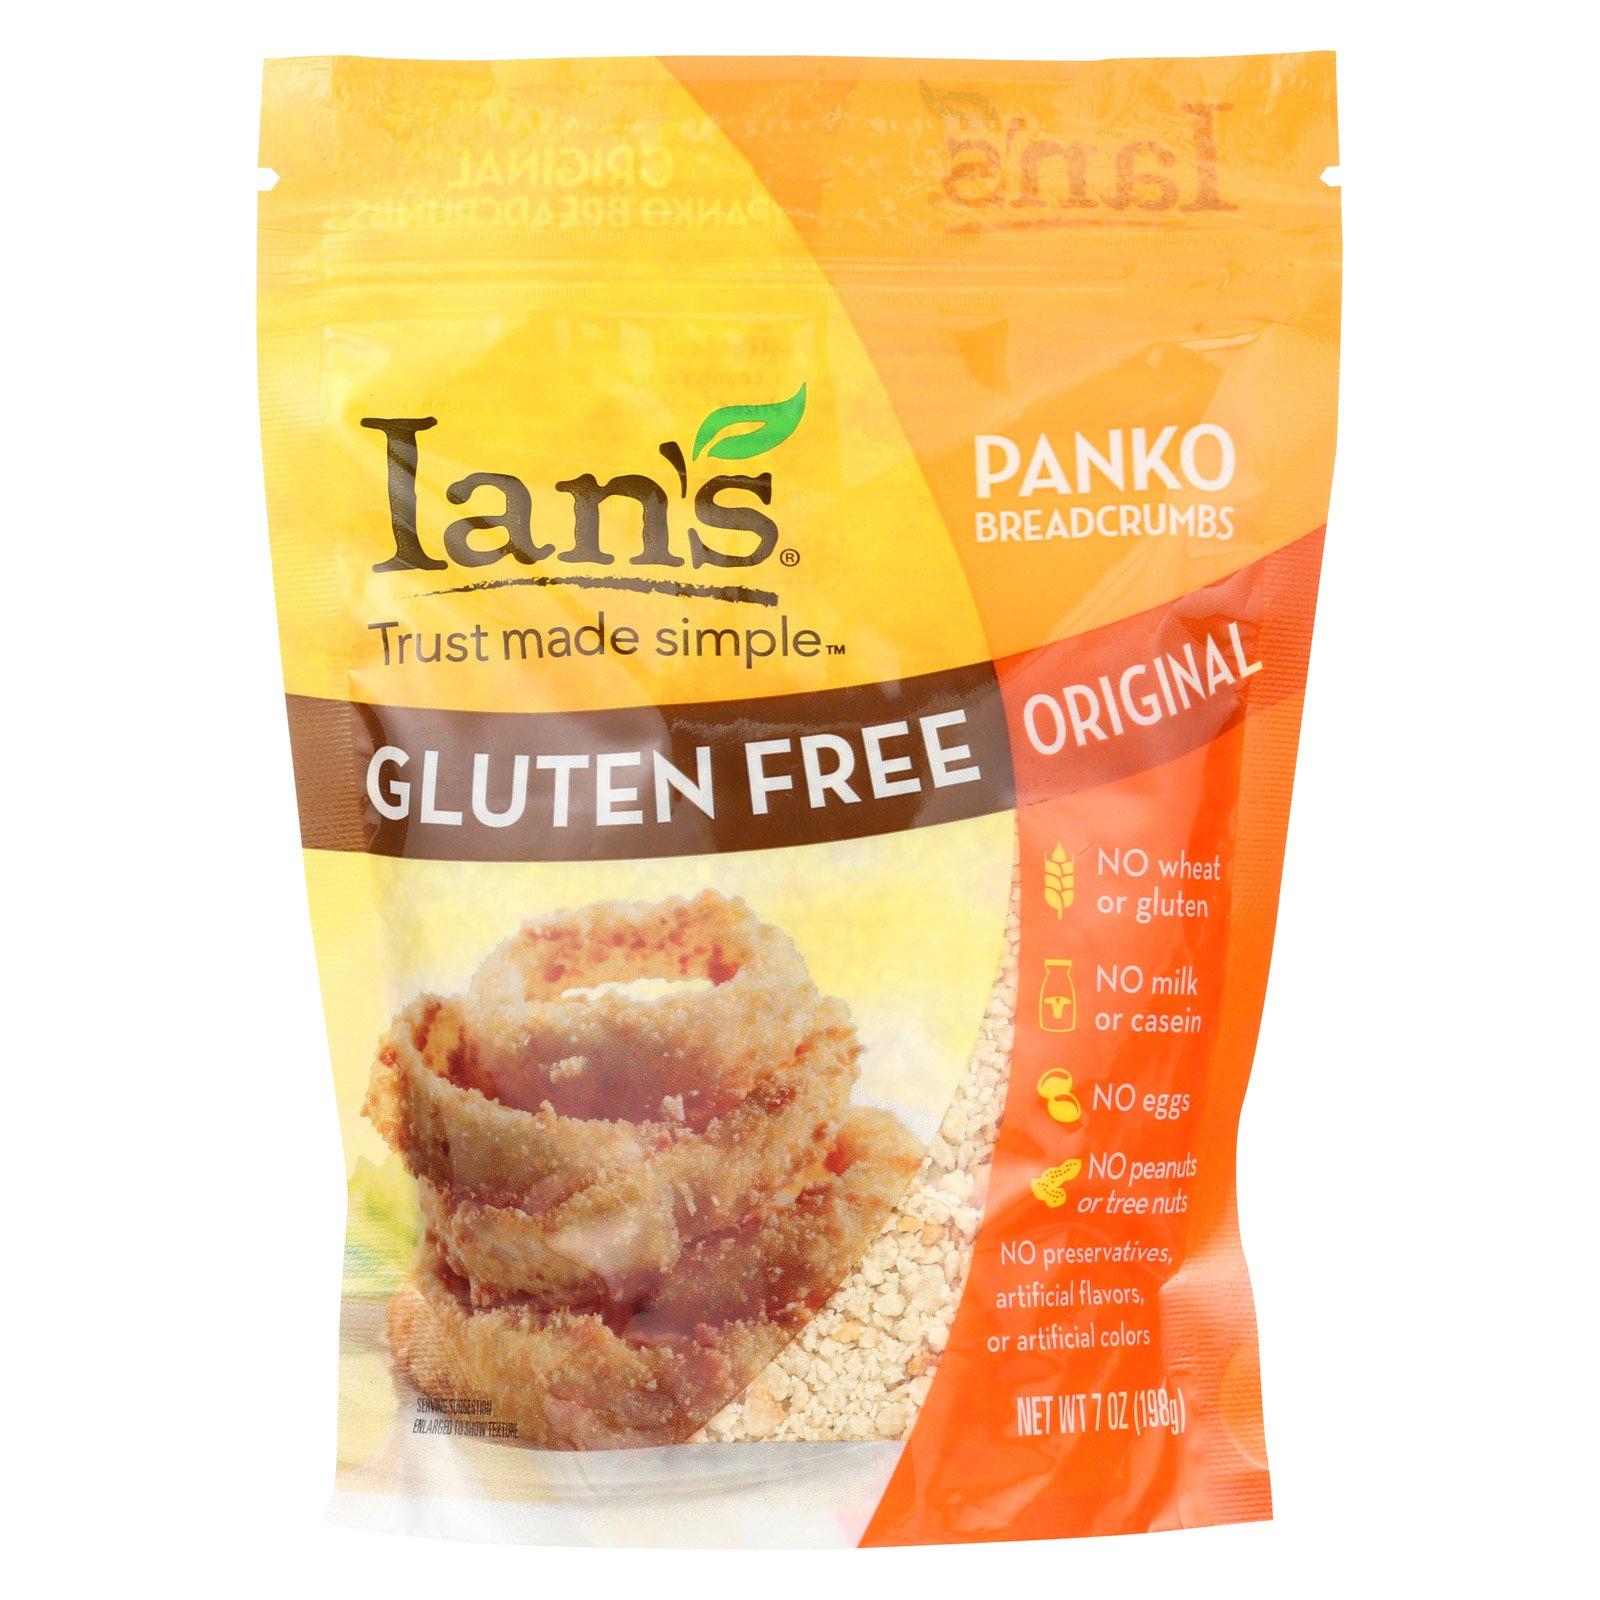 Ian's Panko Breadcrumbs - Gluten Free - Case of 8 - 7 oz.